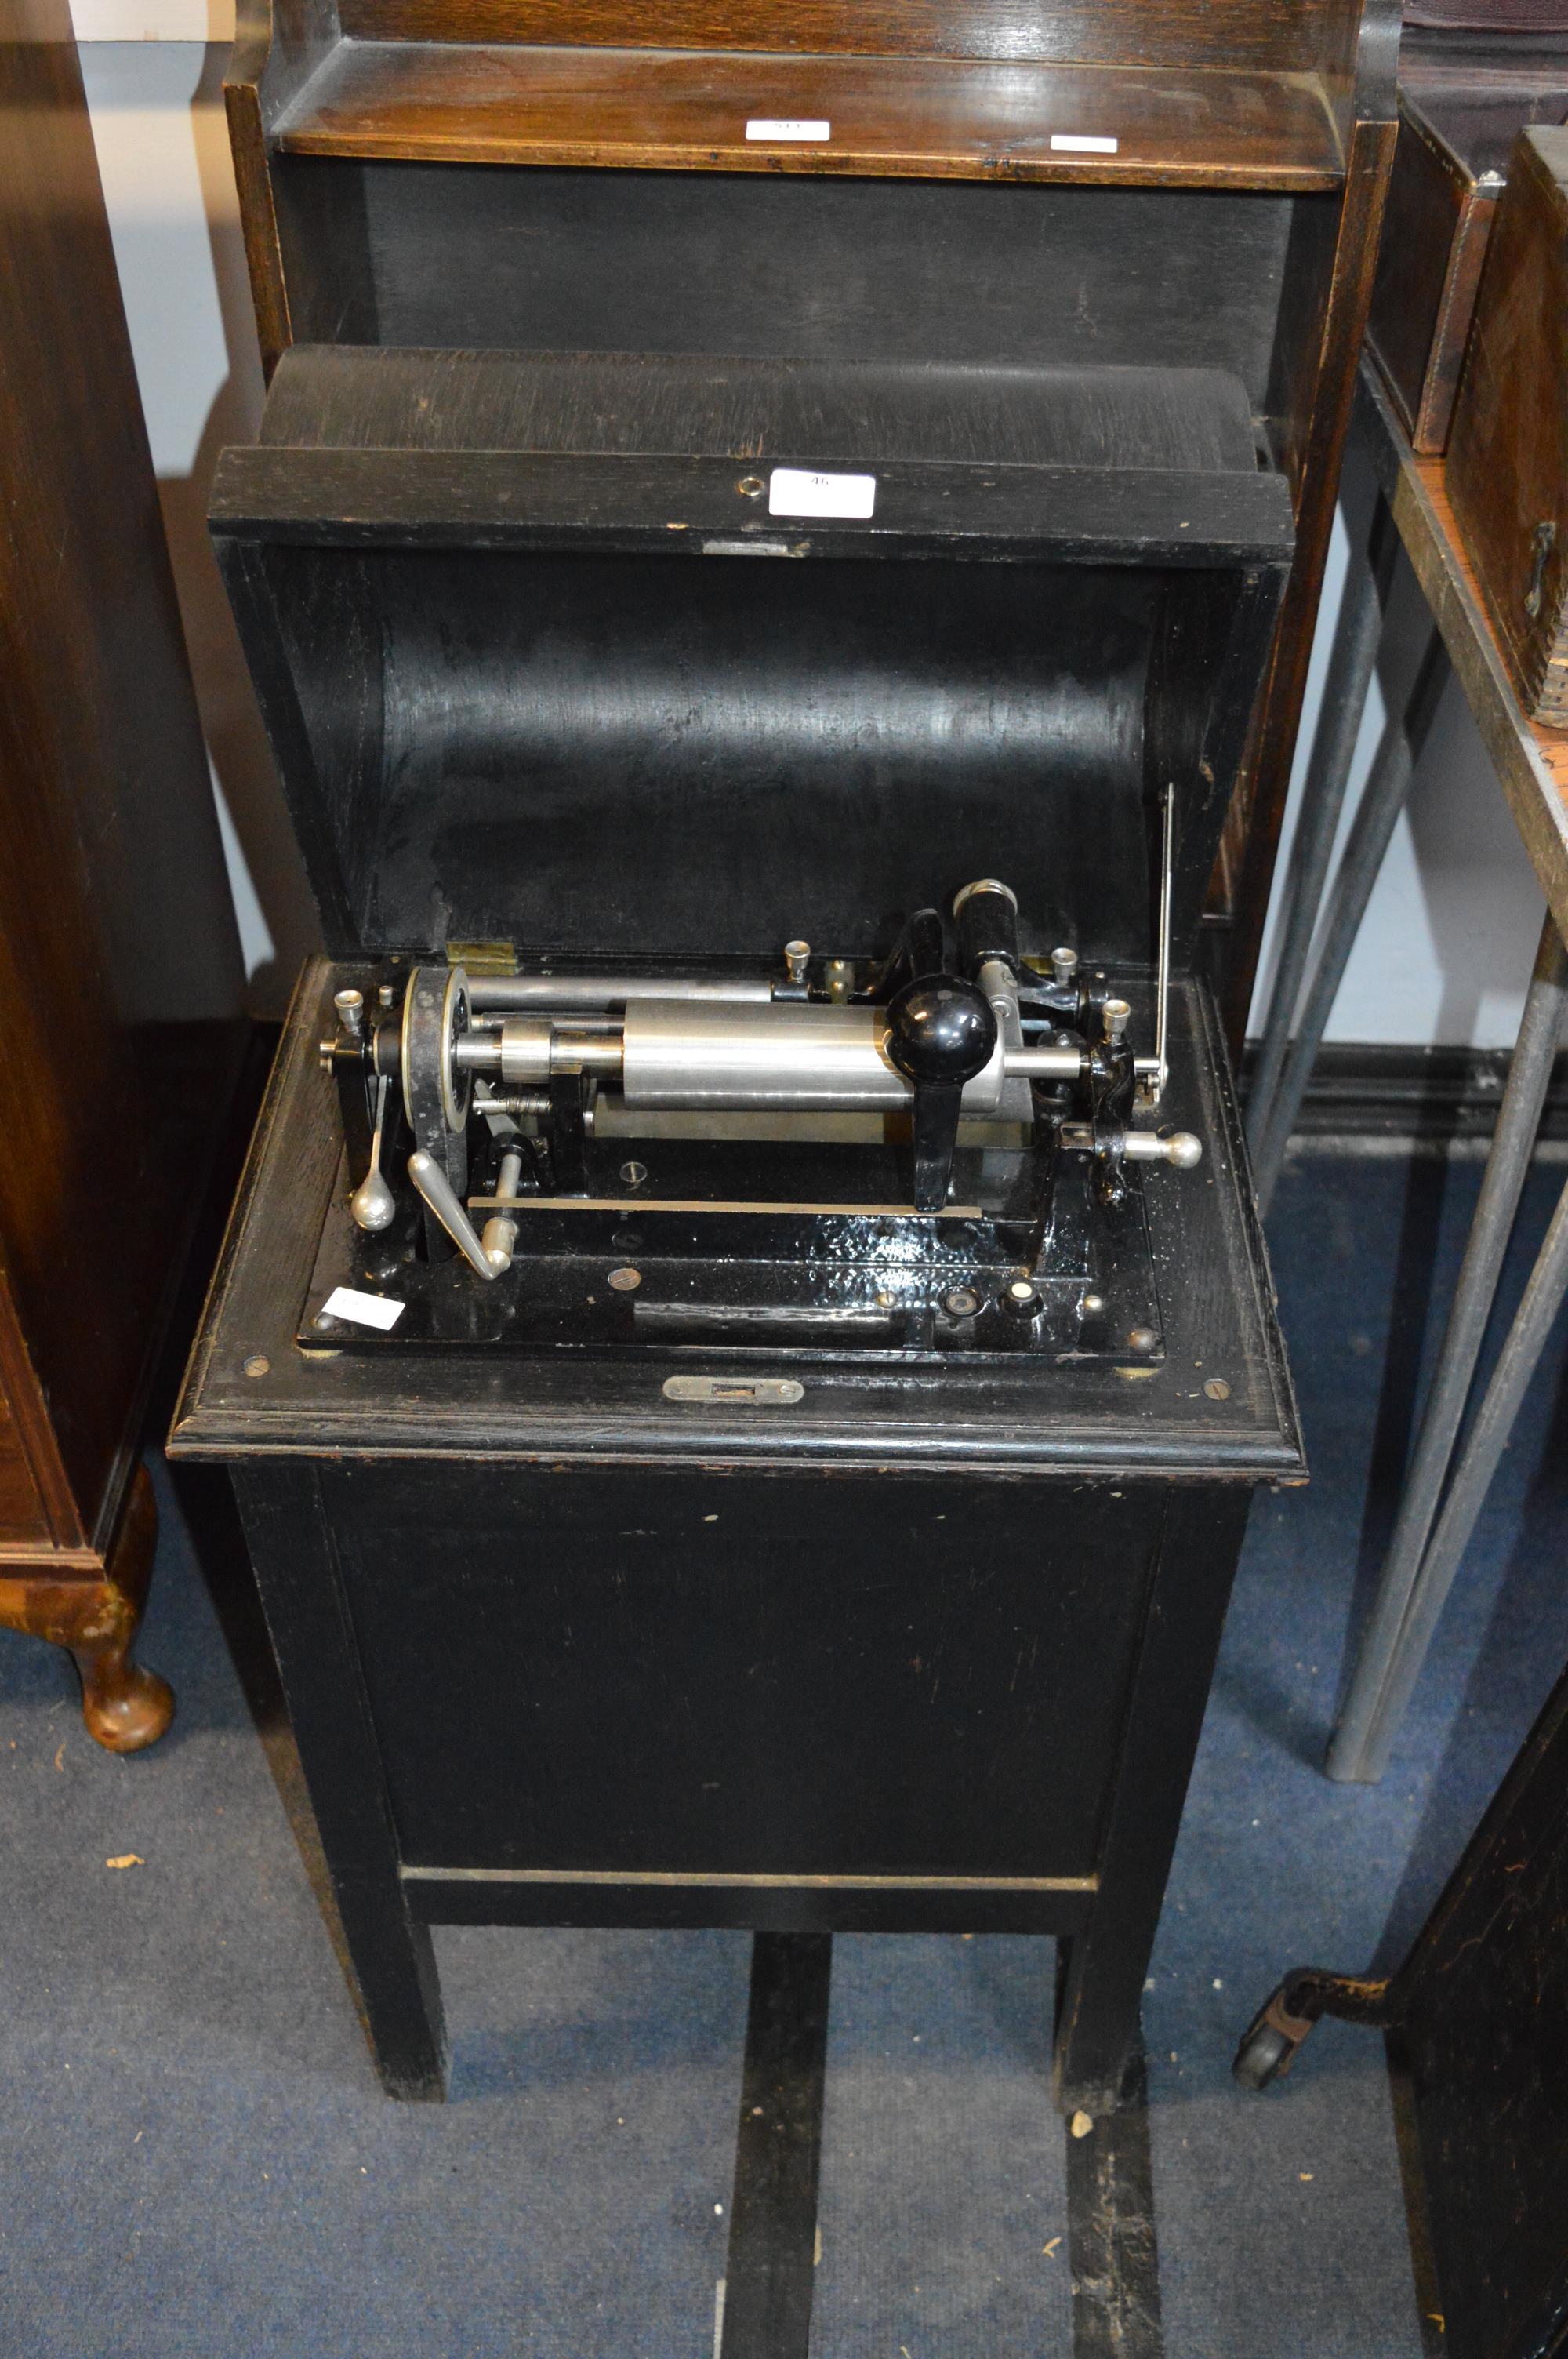 Dictaphone Shaving Machine in Cabinet